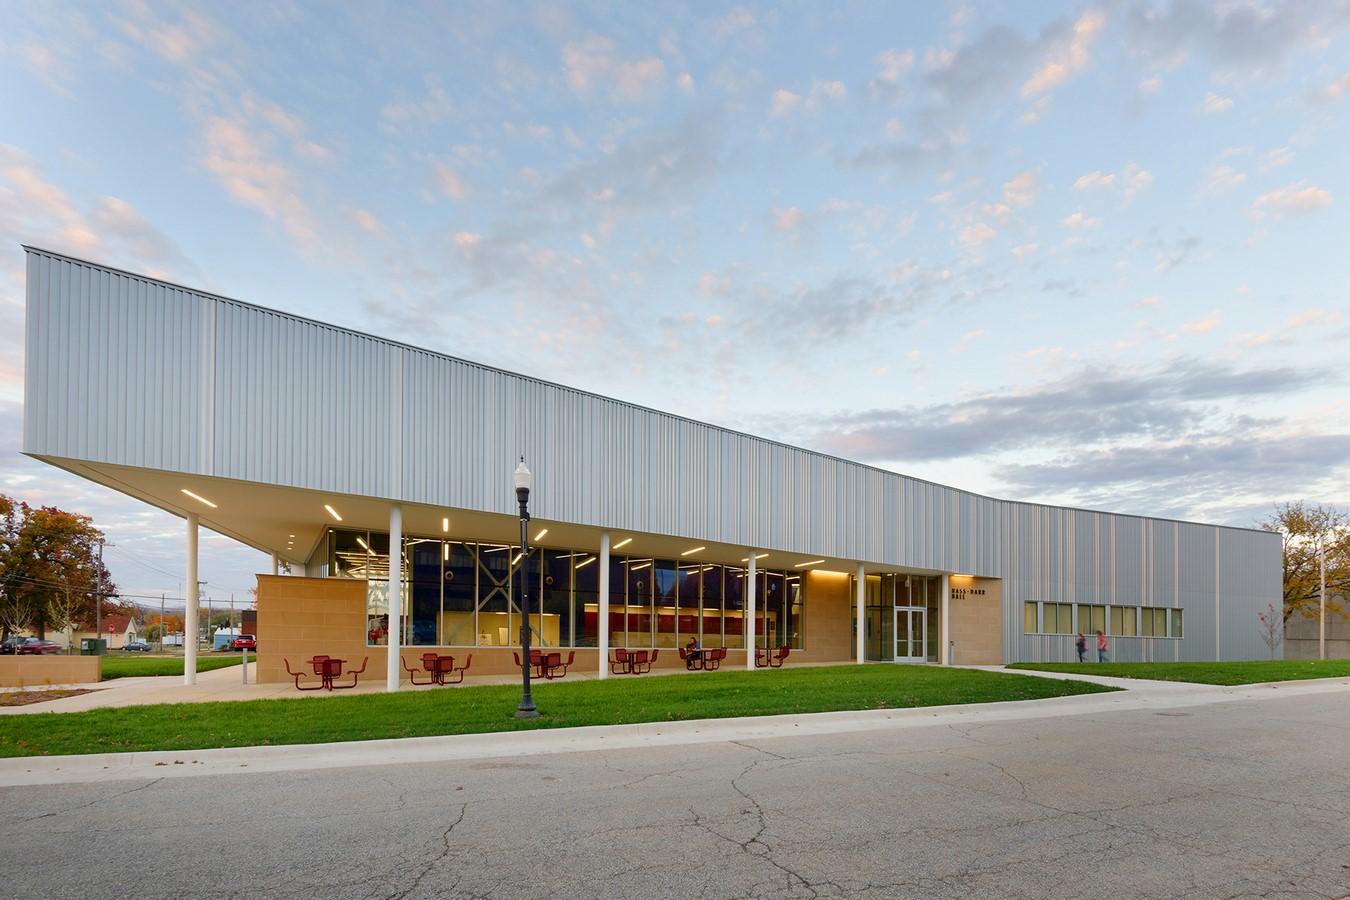 Architects in Kansas city - Top 90 Architects in Kansas city - Sheet14